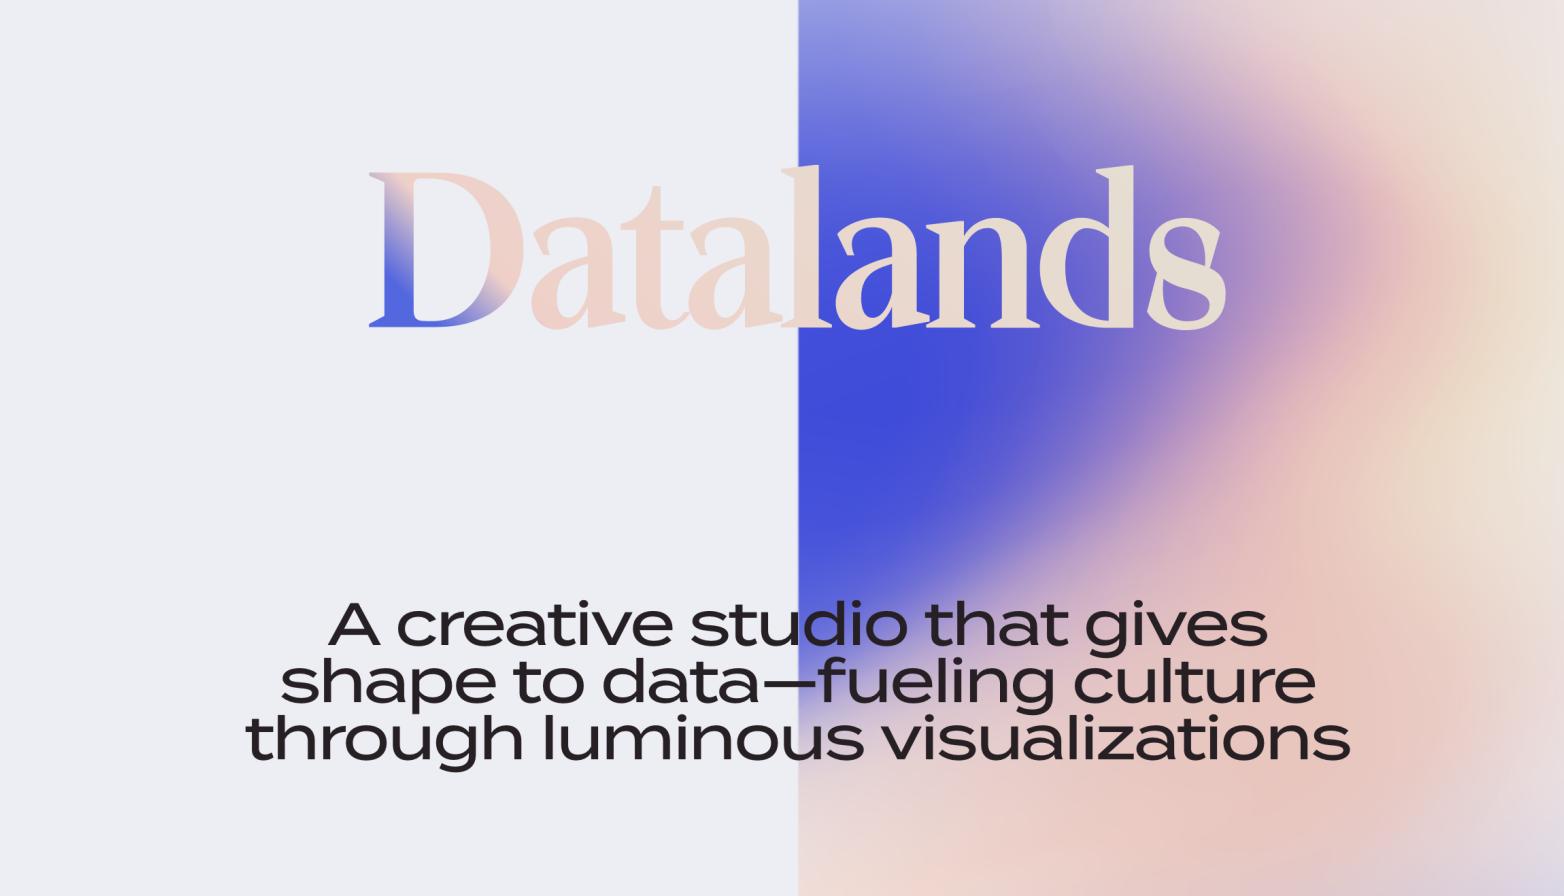 Using gradients in graphic design